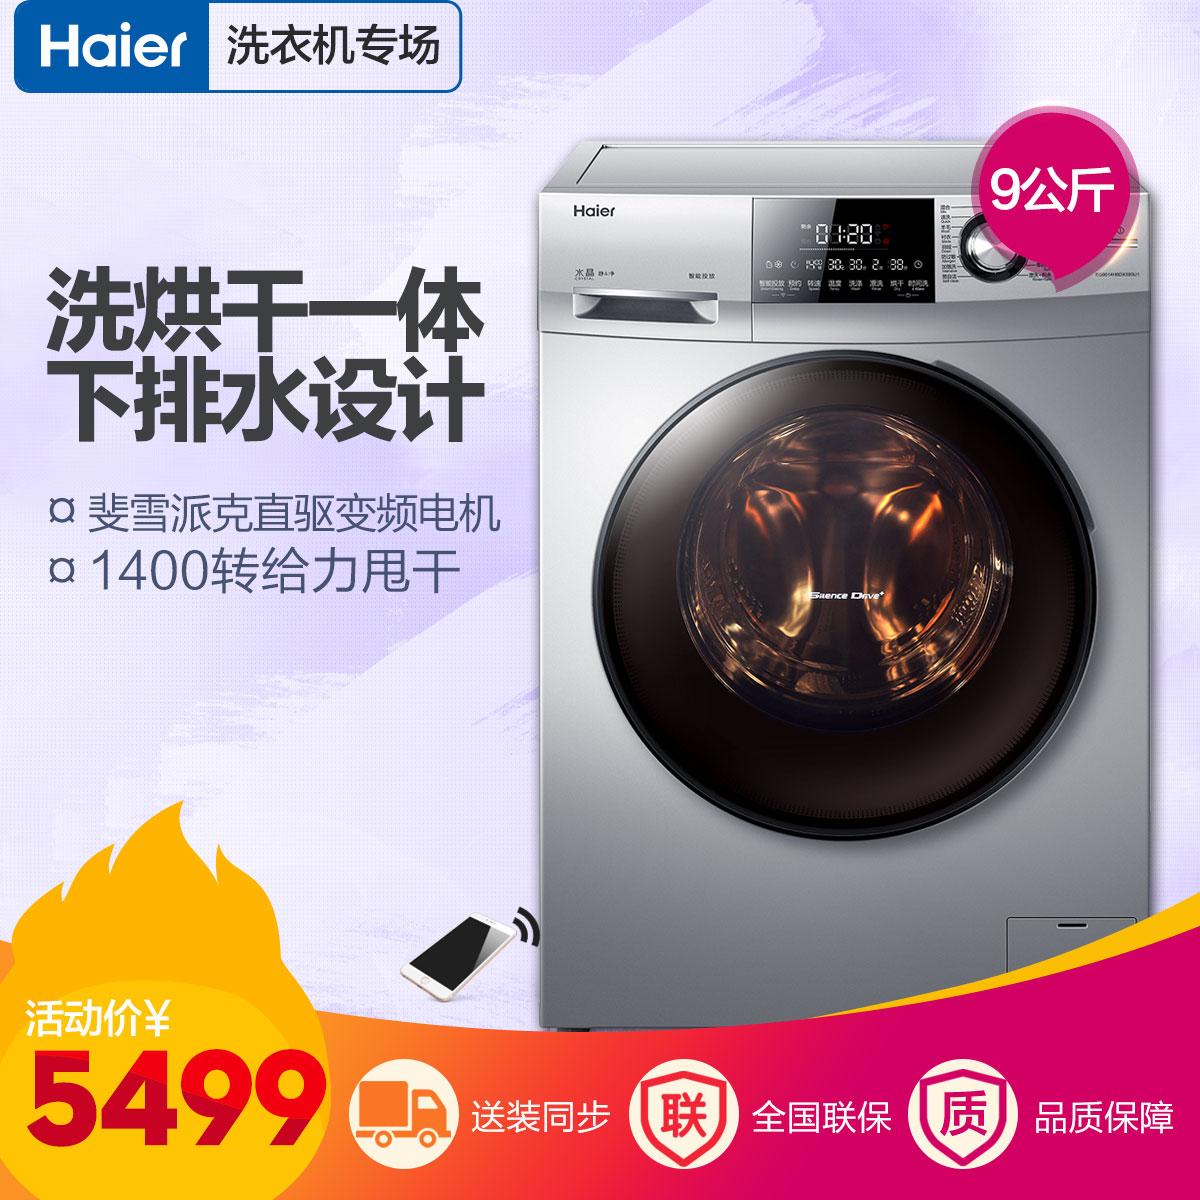 Haier/海尔 滚筒洗衣机 EG9014HBDX59SU1 9公斤直驱变频洗烘一体滚筒洗衣机